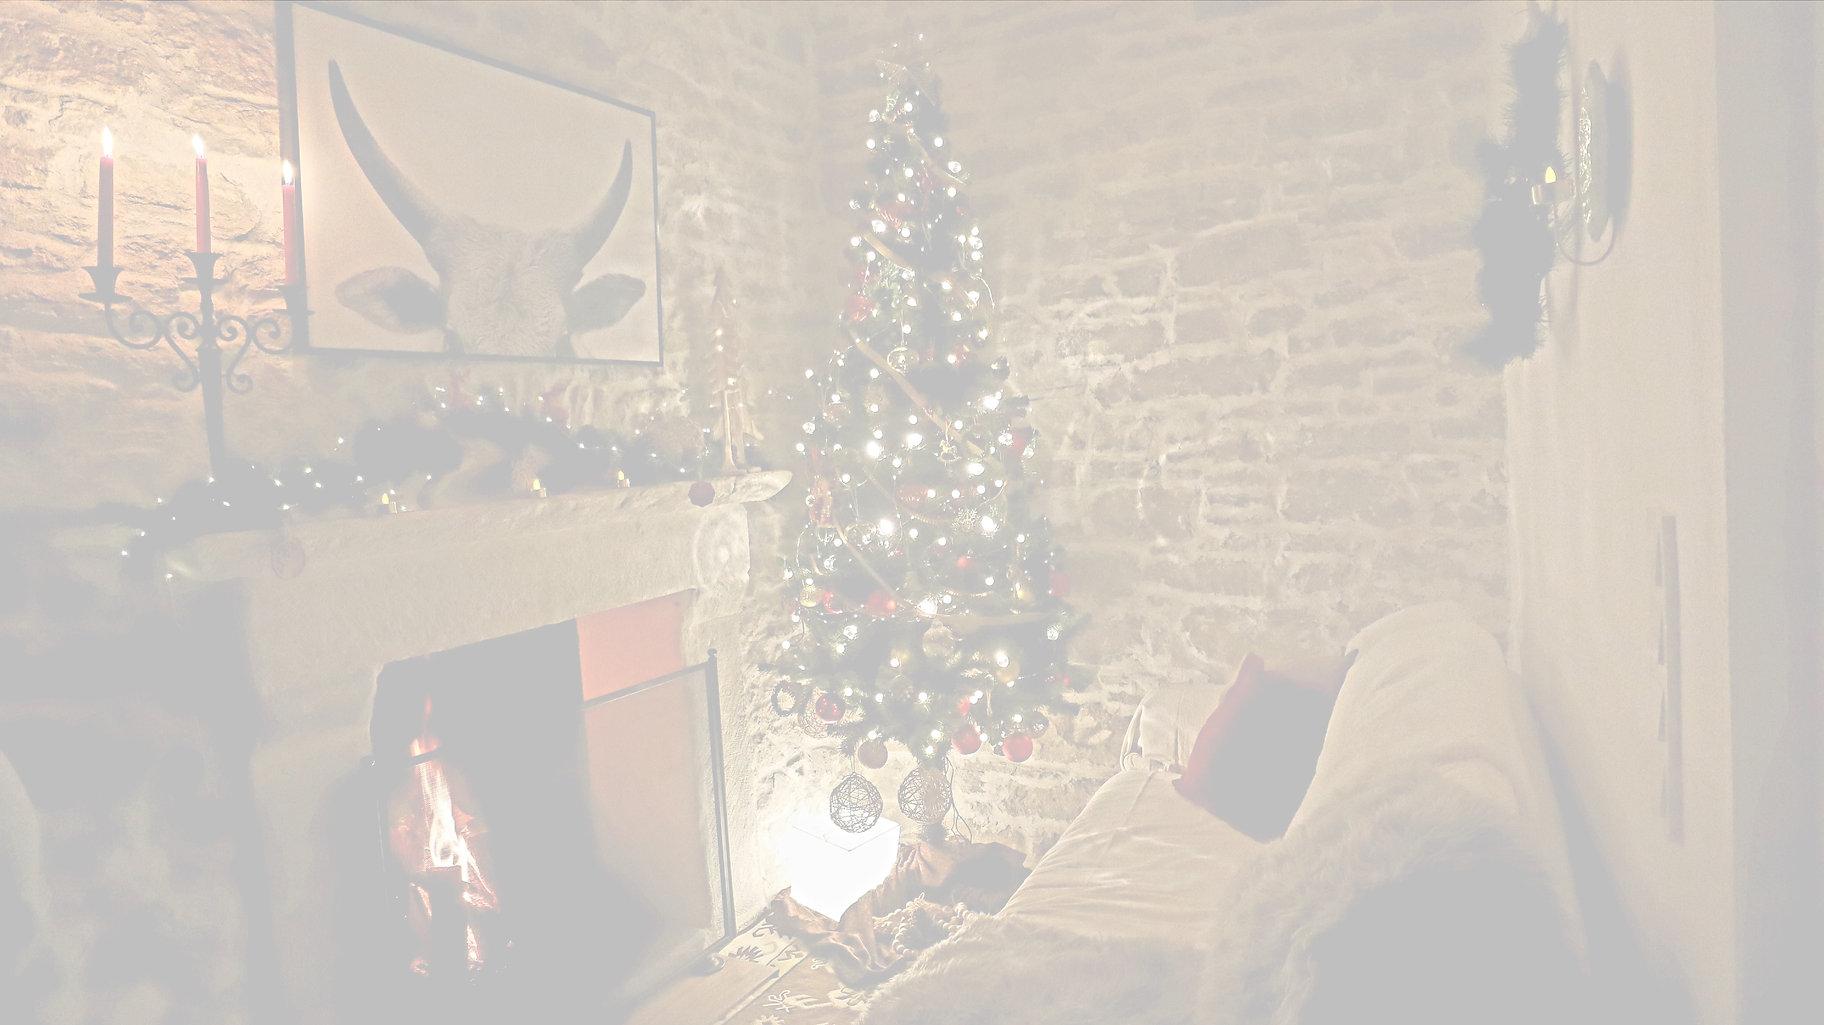 yilbasi_dekorasyonu_christmasdecoration_